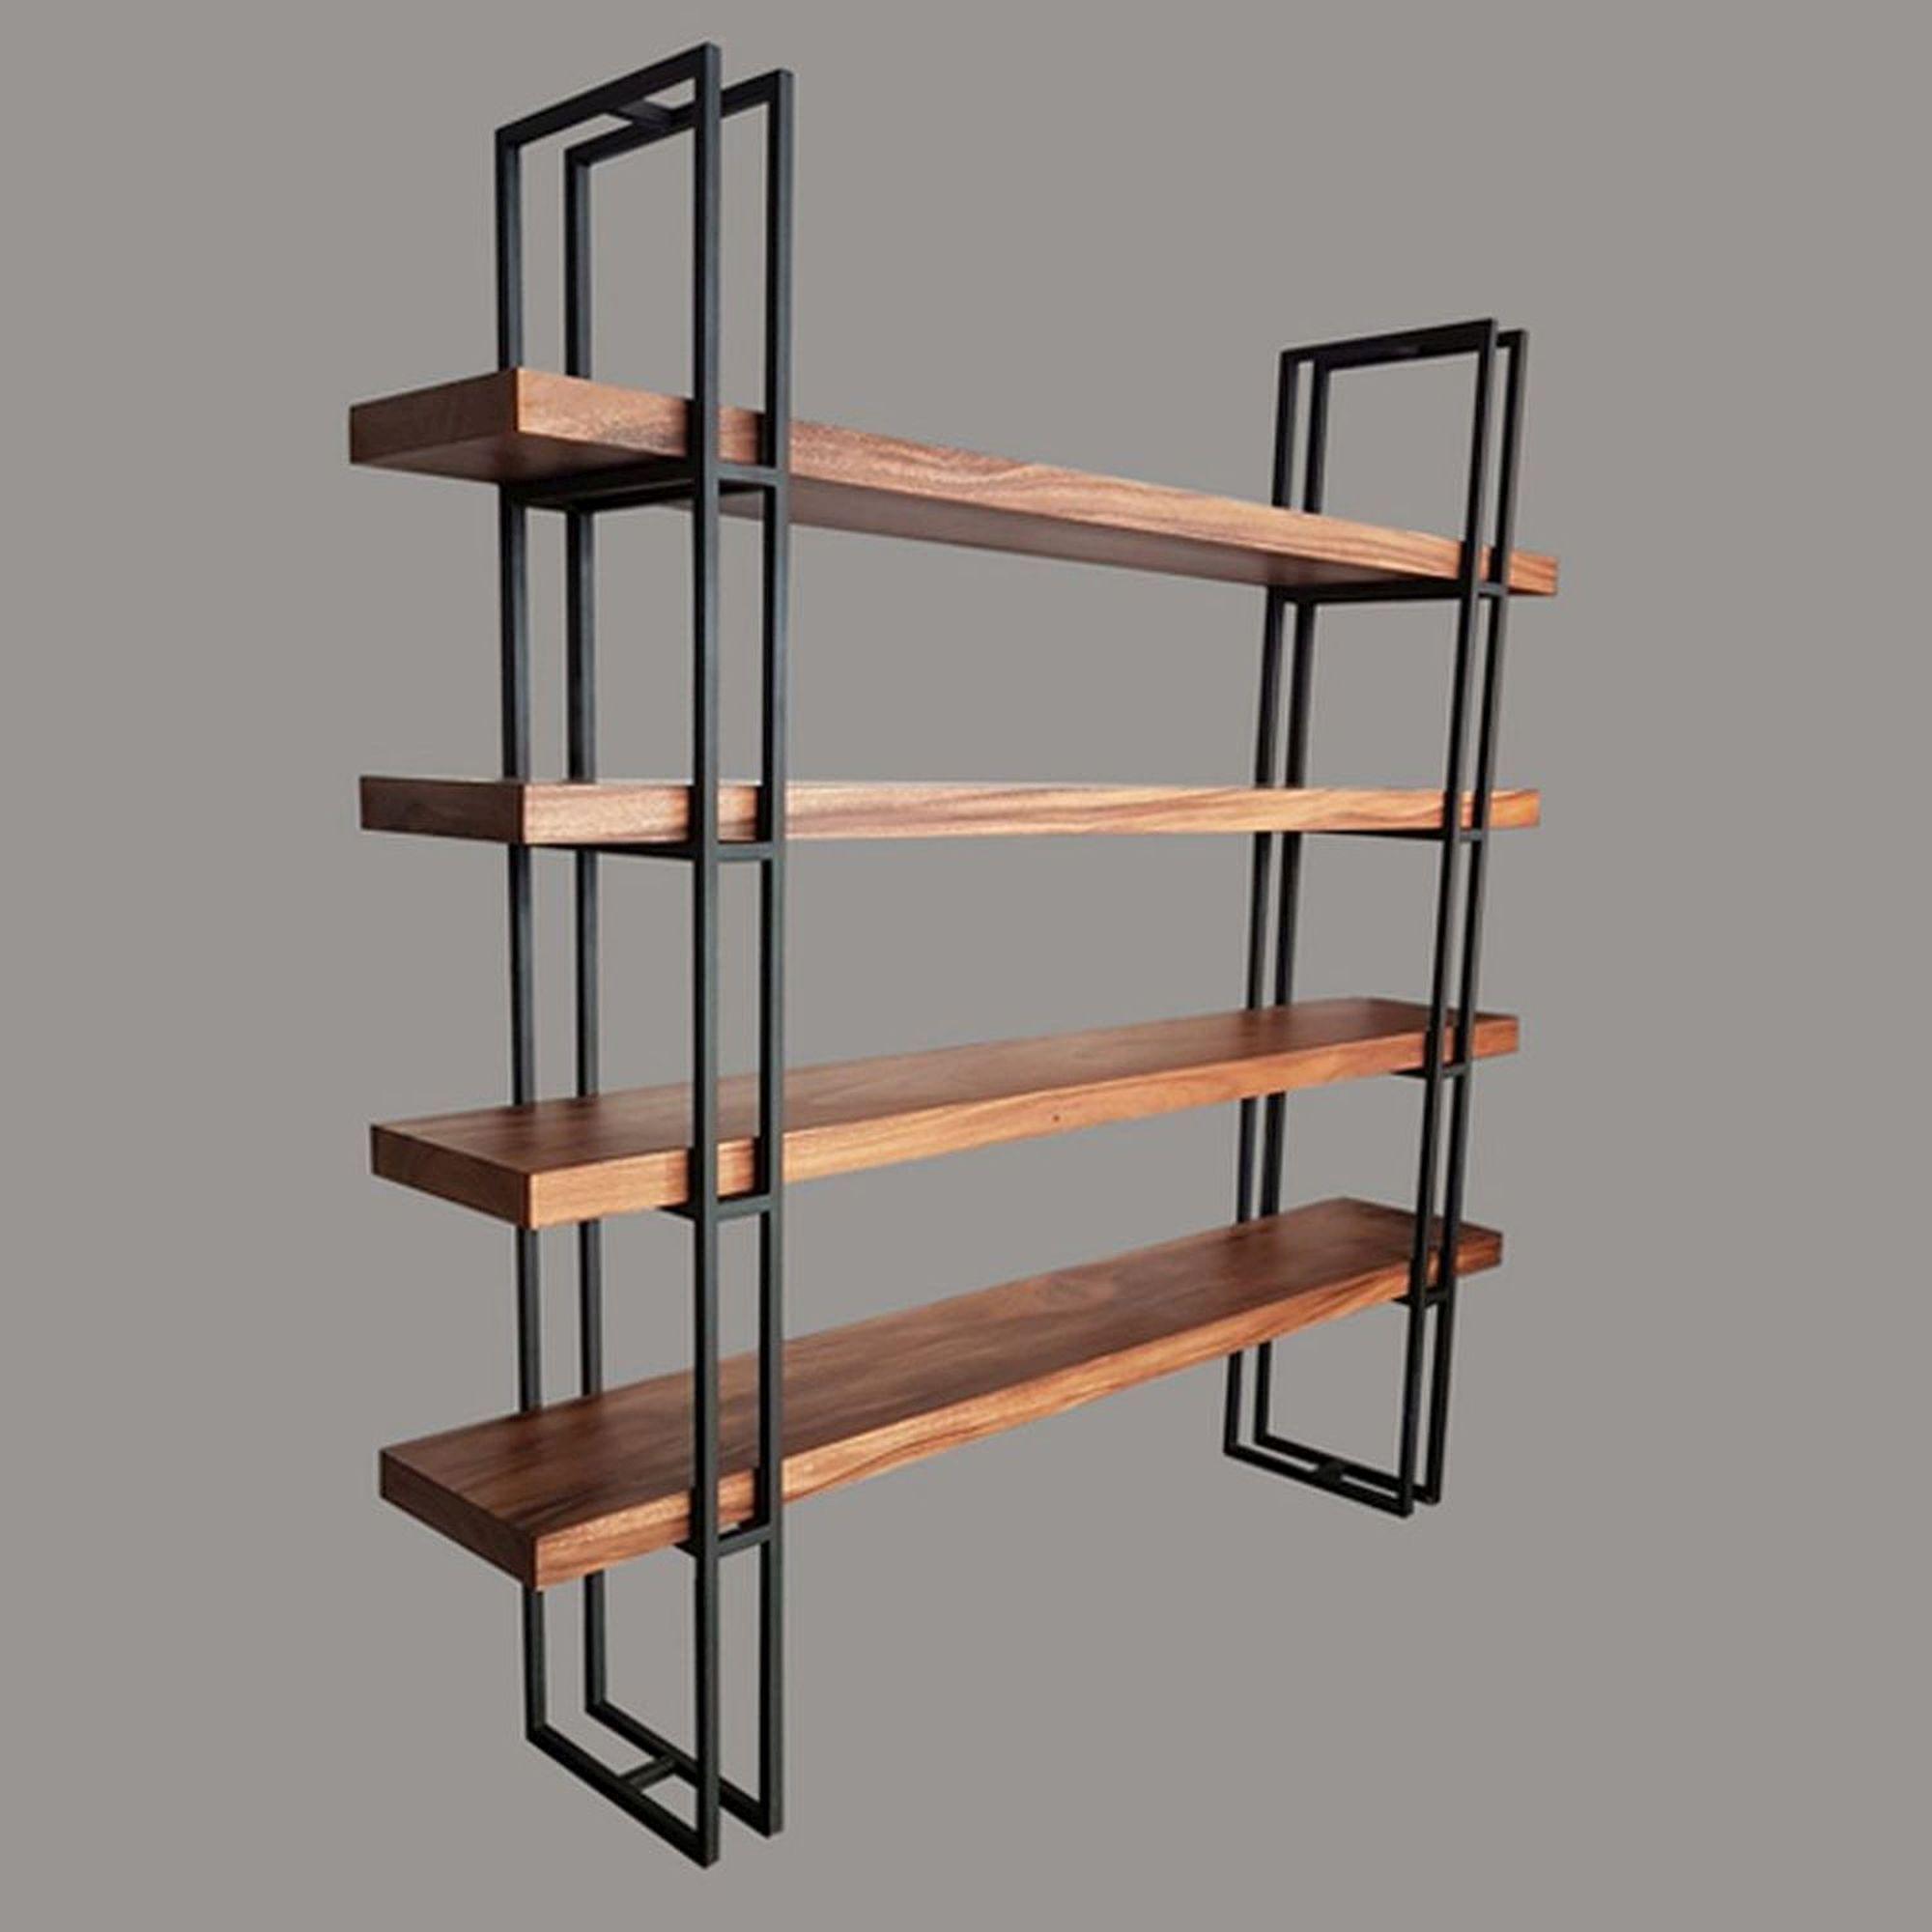 Bookshelves Solid Acacia Wood Bookshelf And Steel Frame L Arcanum Home Sydney Wood Bookshelves Acacia Wood Furniture Color Wood Stain